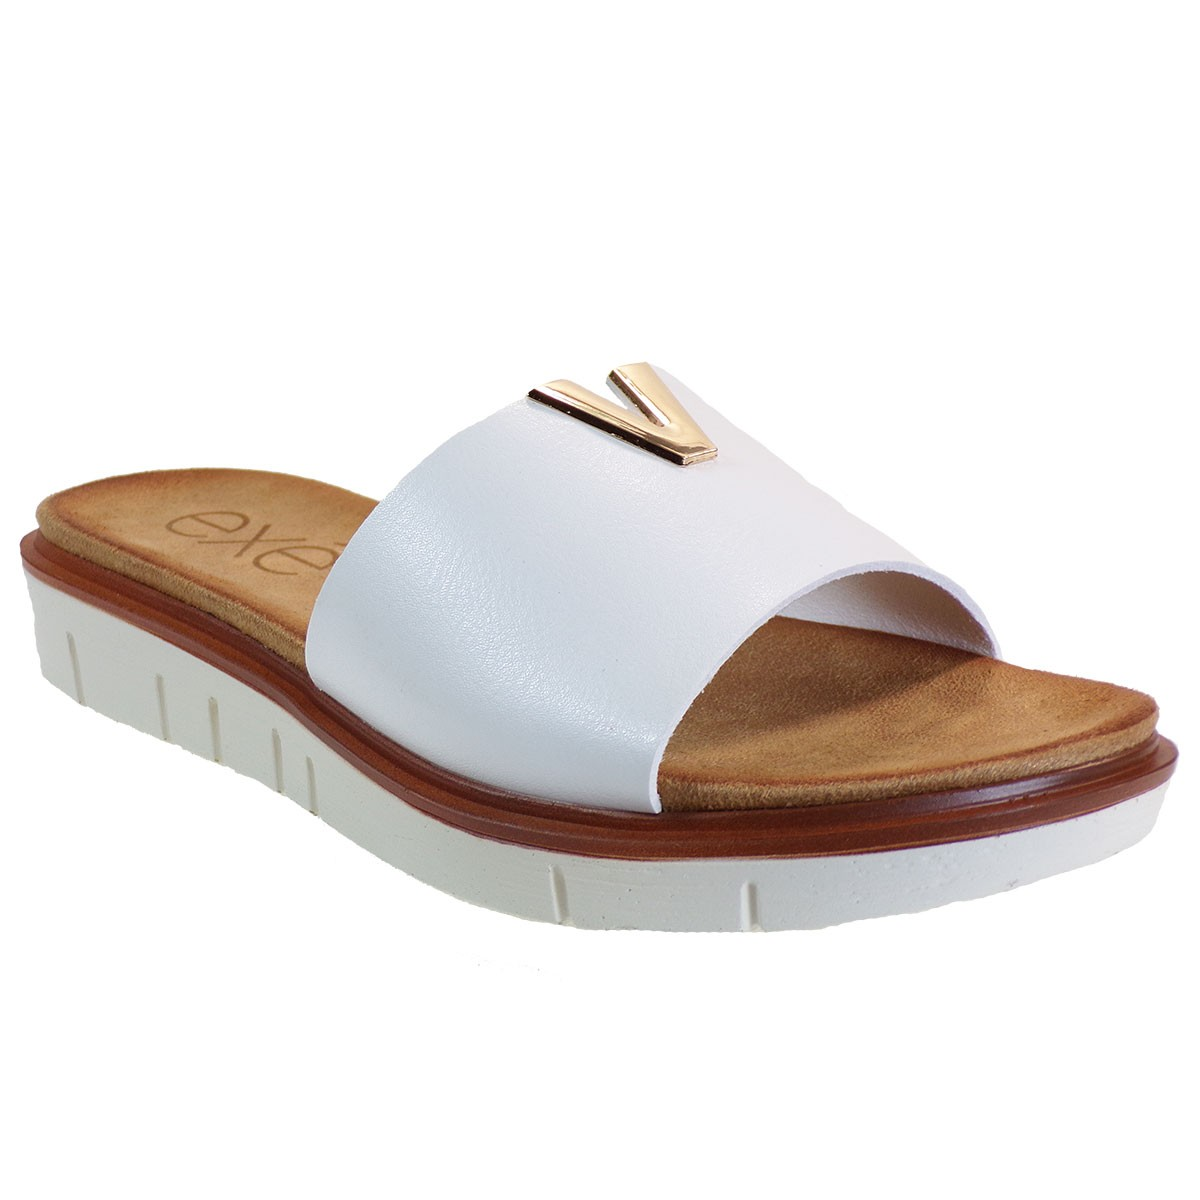 EXE Shoes Γυναικεία Παντόφλας 364-BZD86936 Λευκό M489Q364265105